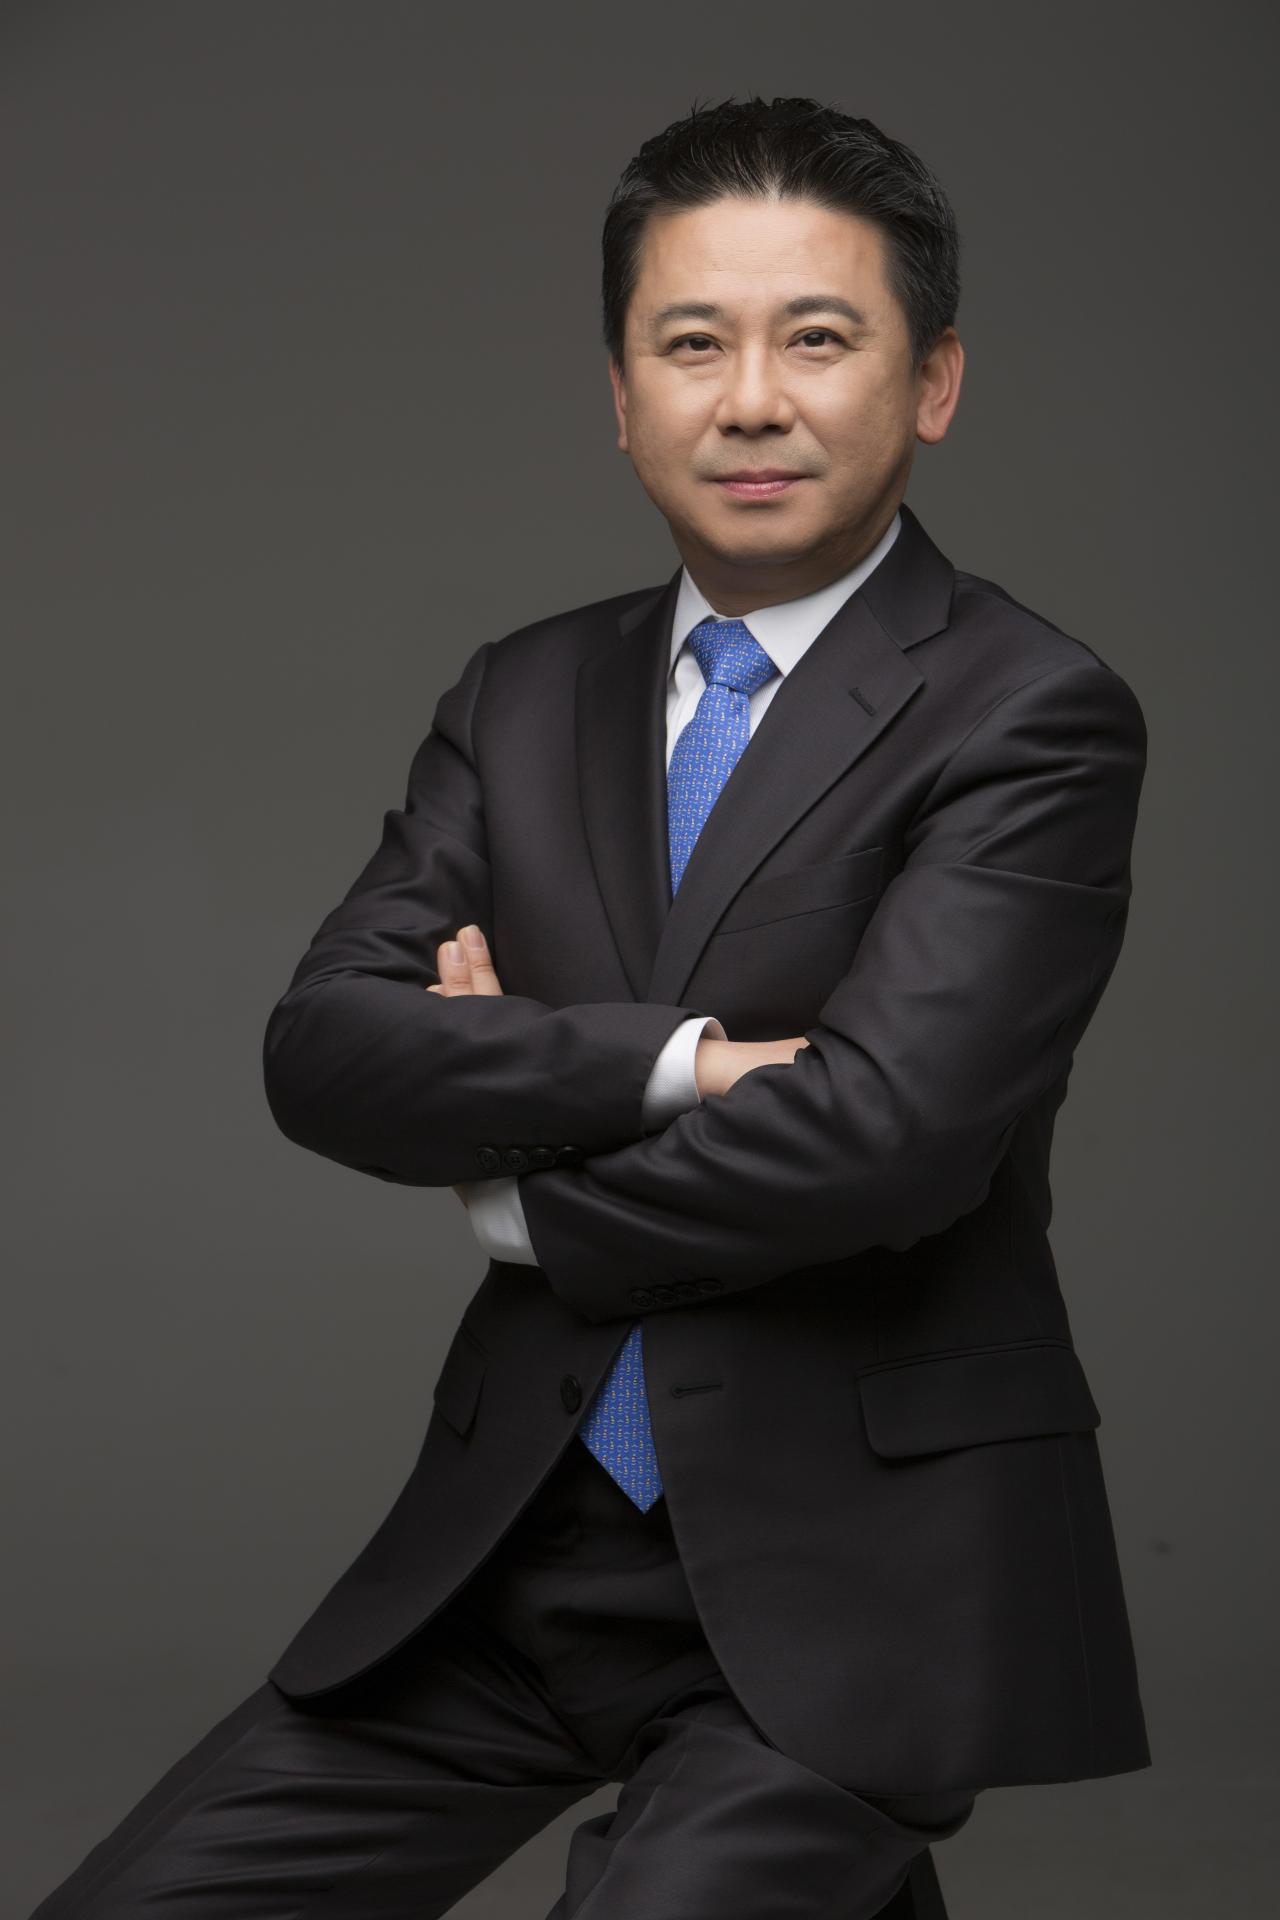 Lee Jong-jin (HSBC)